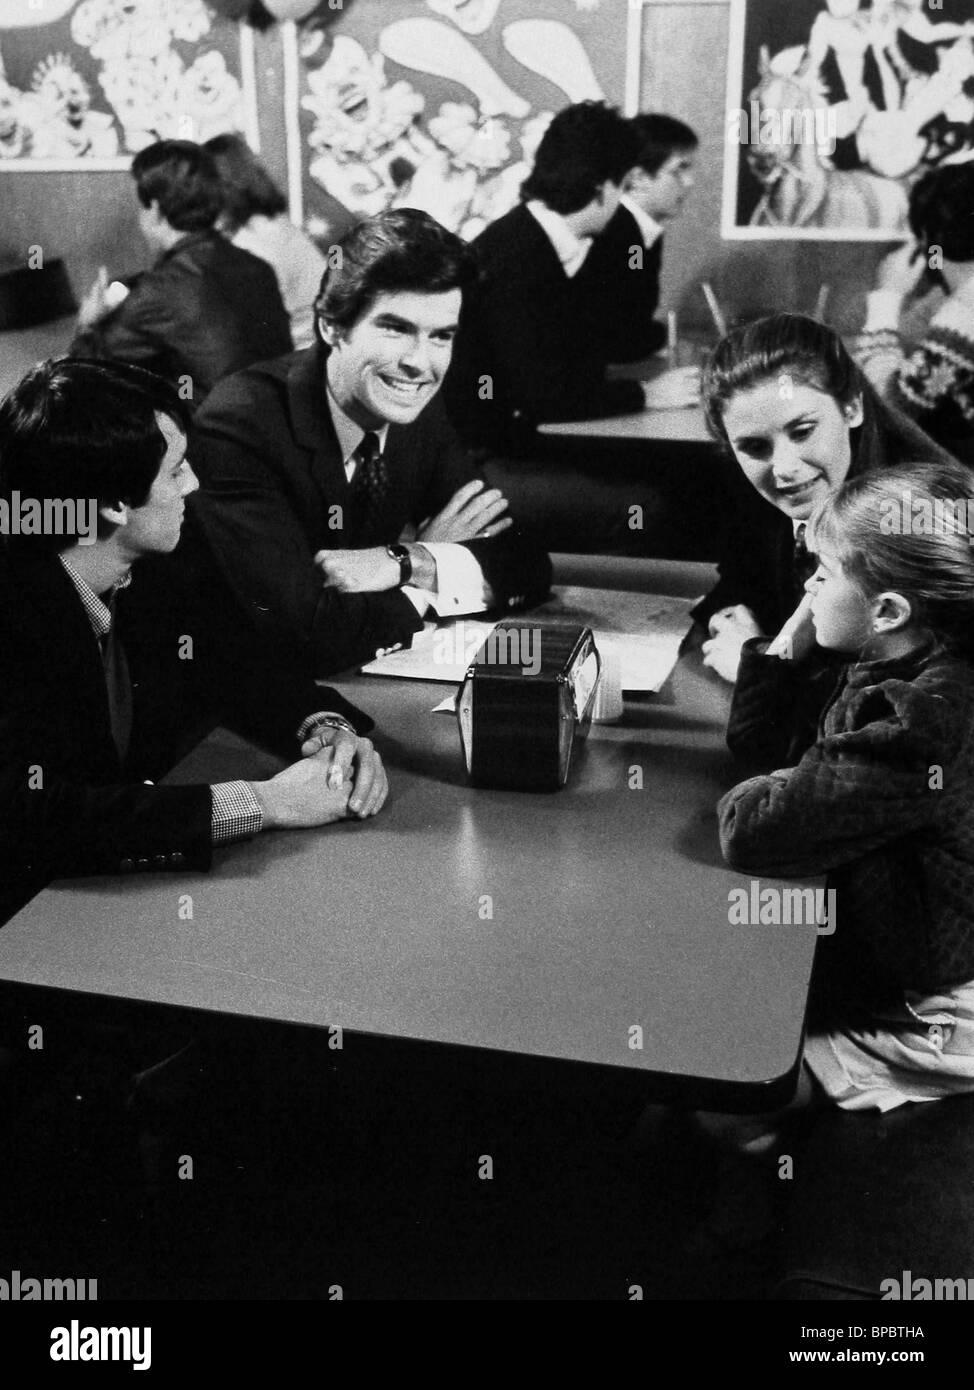 ERIC BROWN, Pierce Brosnan, STEPHANIE ZIMBALIST, BRIDGETTE ANDERSEN, REMINGTON STEELE, 1982 Foto Stock